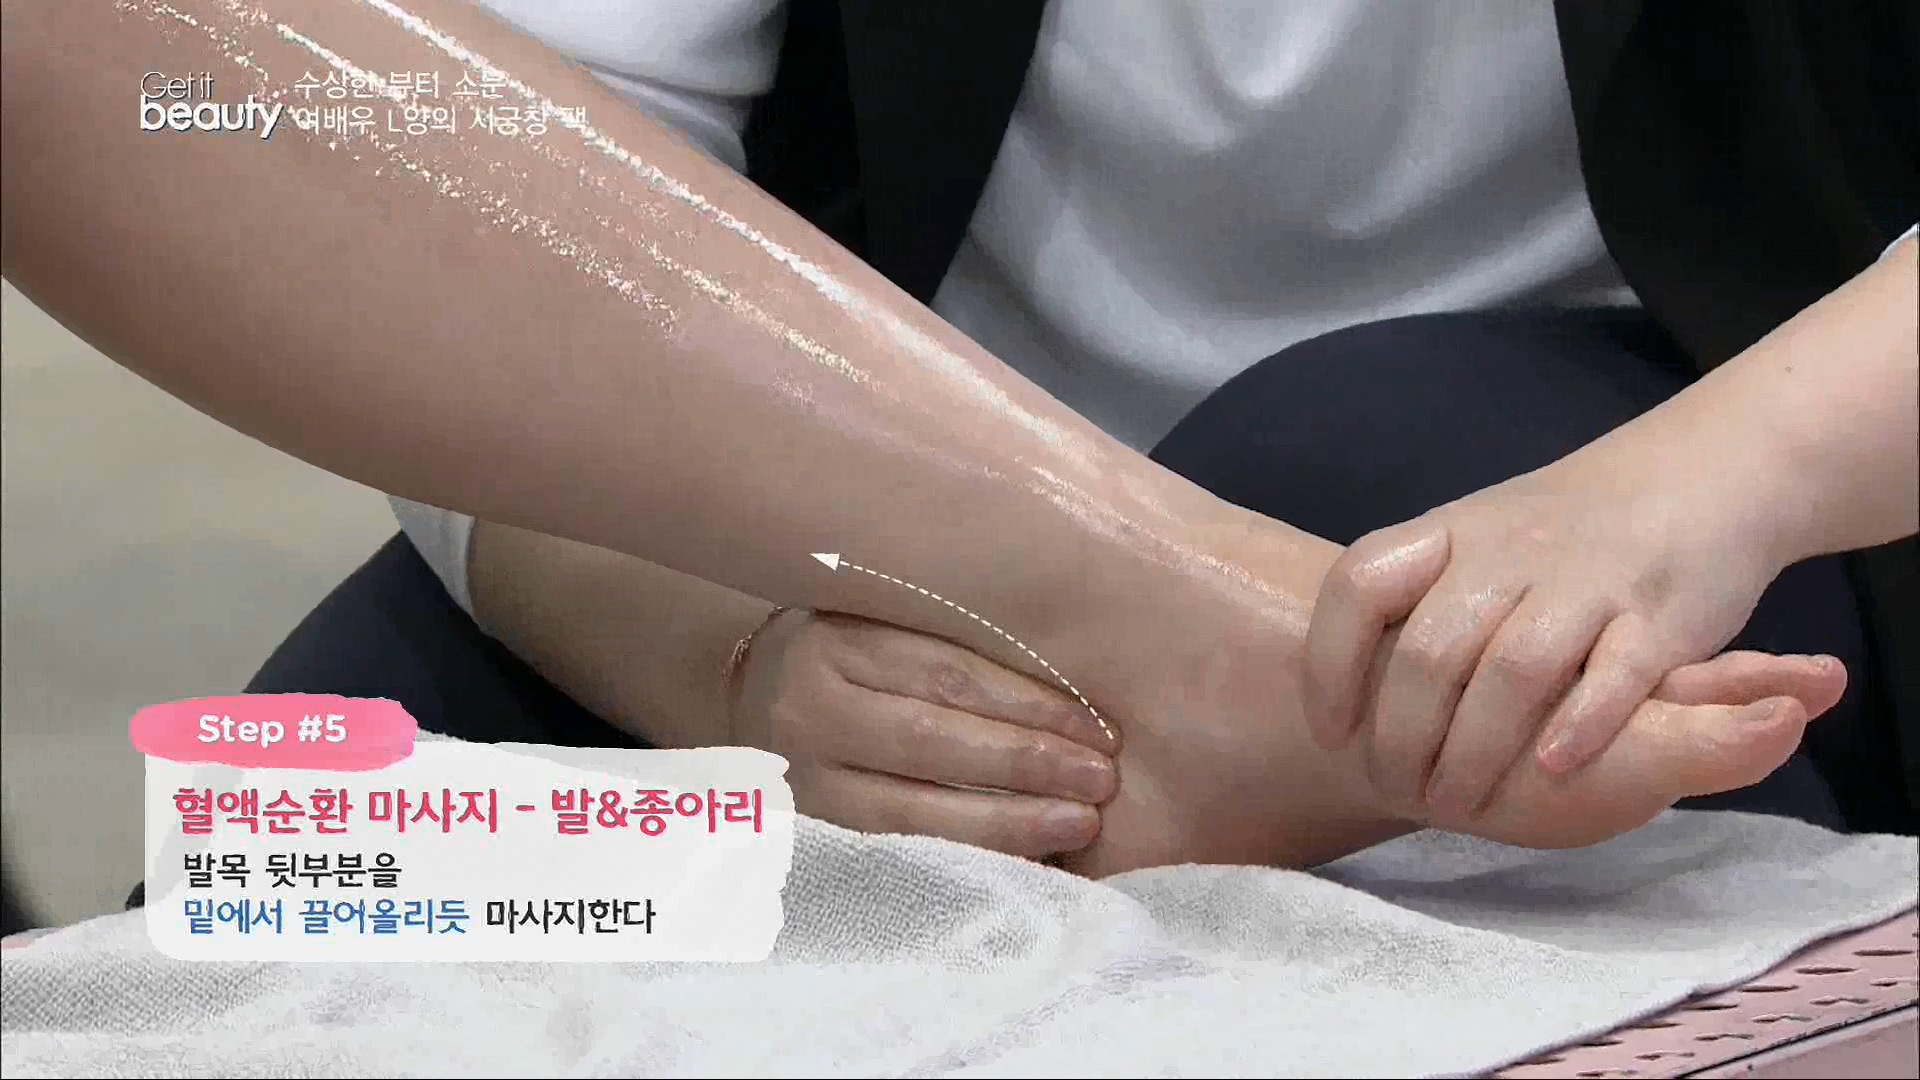 Step#5.혈액순환 마사지-발&종아리 발목 뒷부분을 밑에서 끌어올리듯 마사지한다.